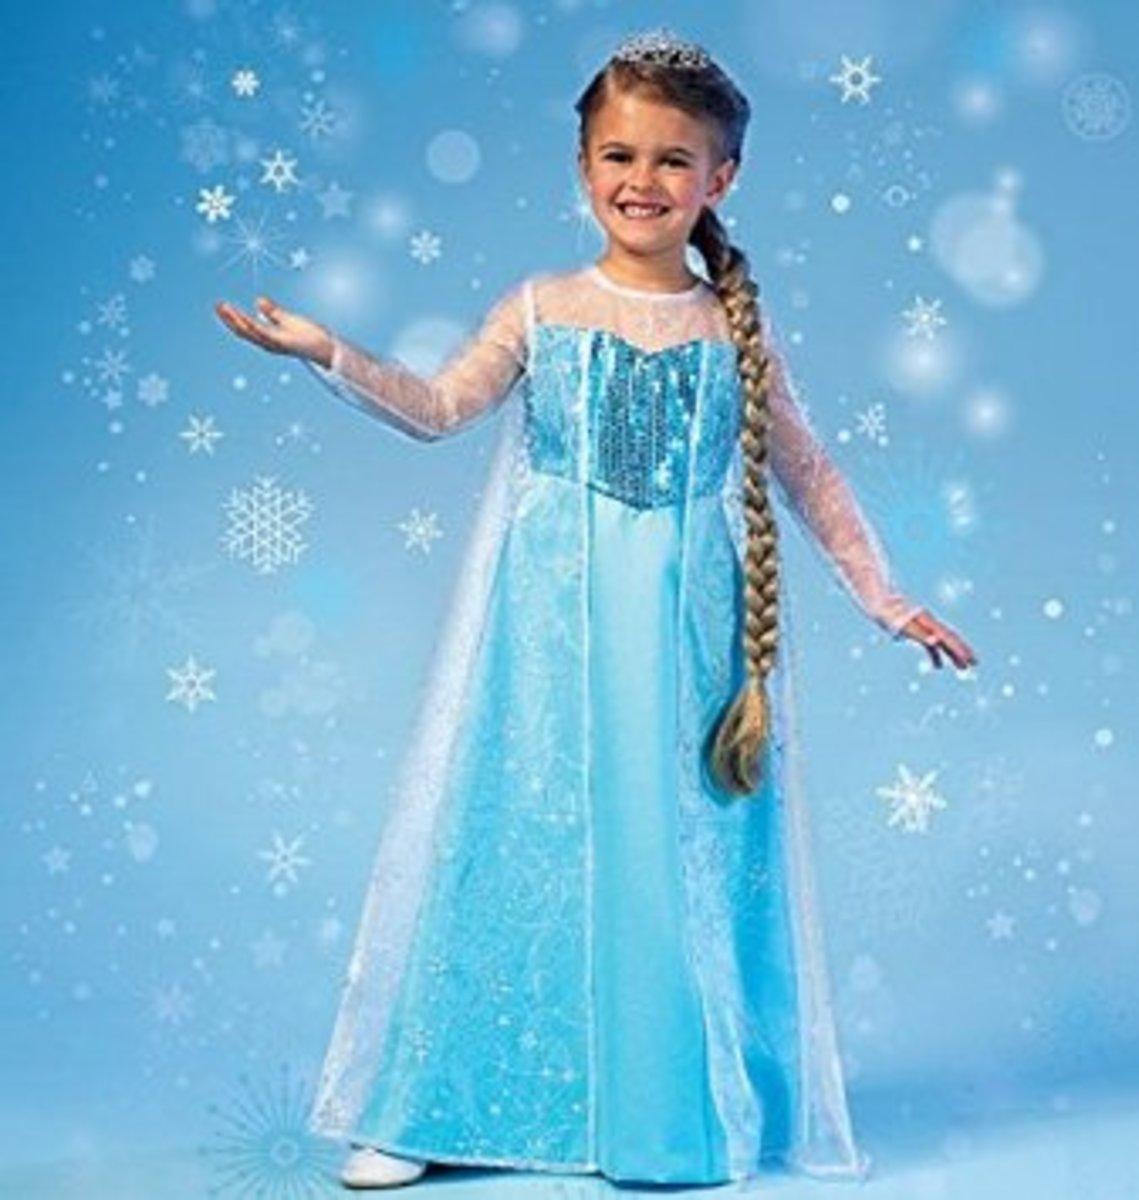 Transform your little girl into an enchanting Frozen princess!